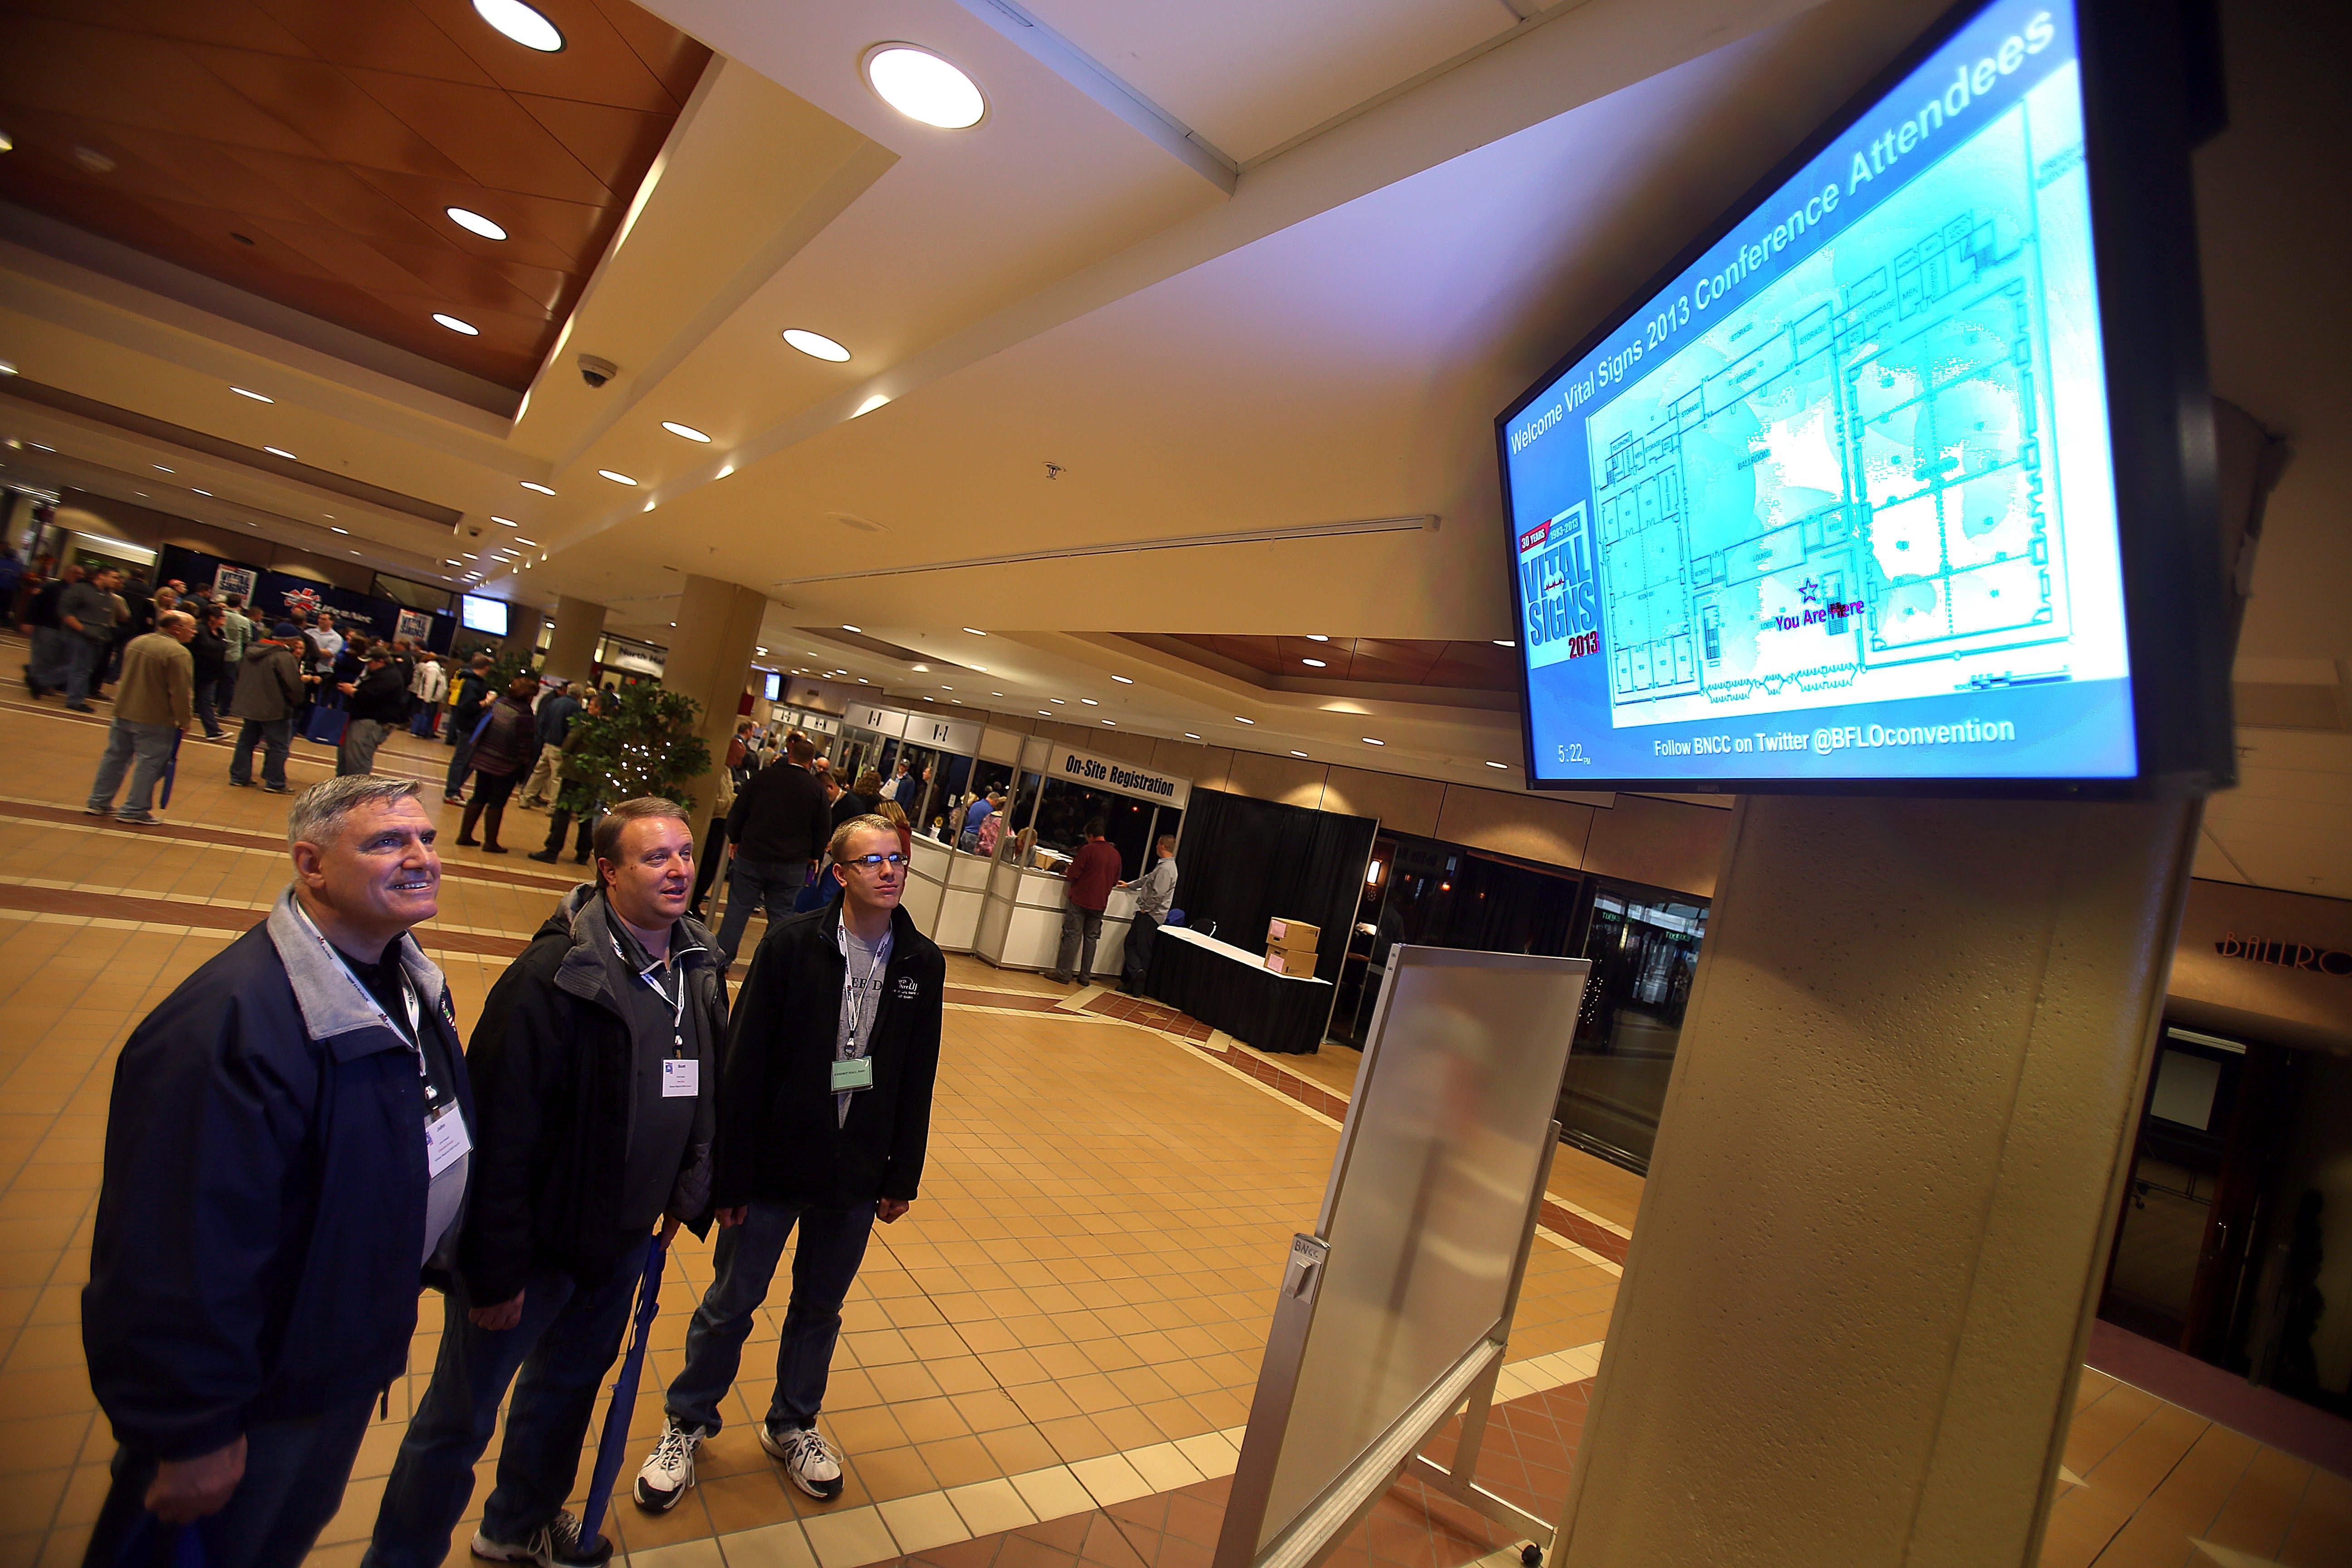 Exploring the new wireless network at the Buffalo Niagara Convention Center Friday are Long Island emergency medical technicians, from left,  John Hassett, Scott Glazer and Matt Glazer.